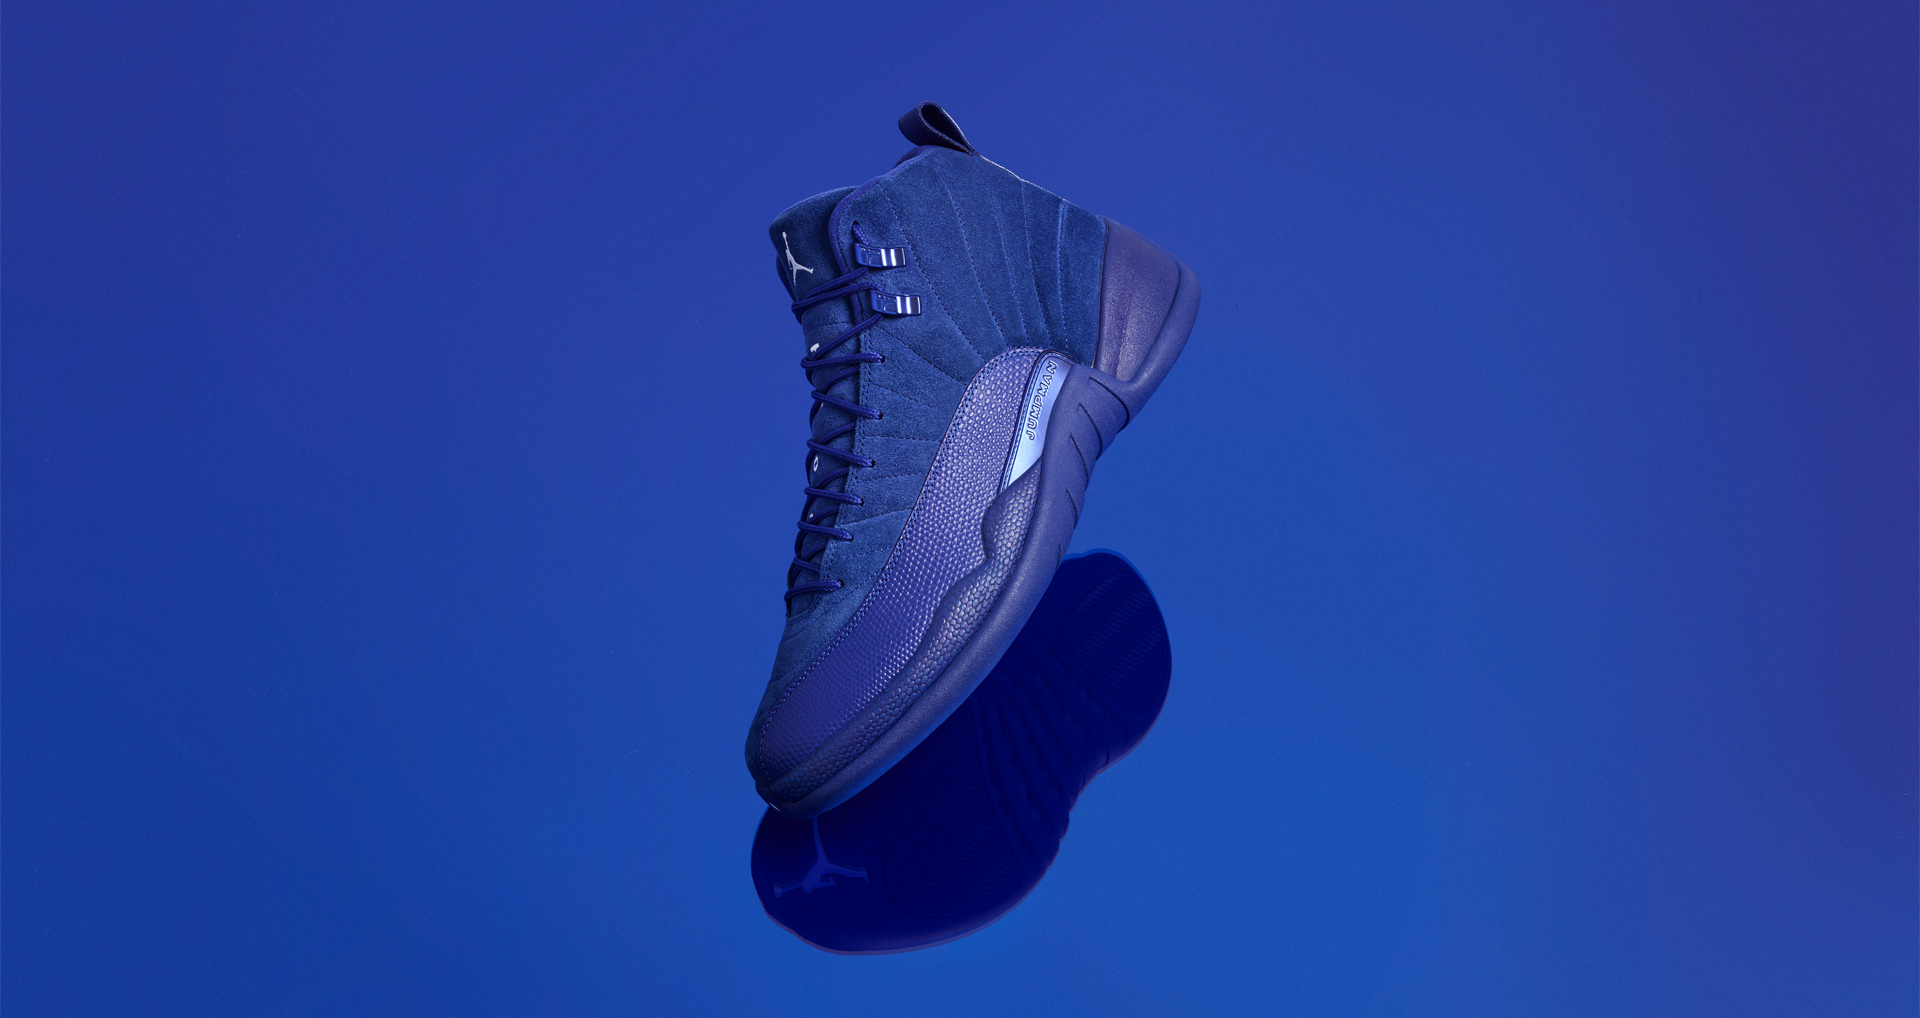 online retailer b0a66 6f359 ... high black gamma blue varsity maize 378037 006 patent leather  basketball men shoe 12.5 0686907527316 books c02af 5370b  new zealand air  jordan 12 retro ...